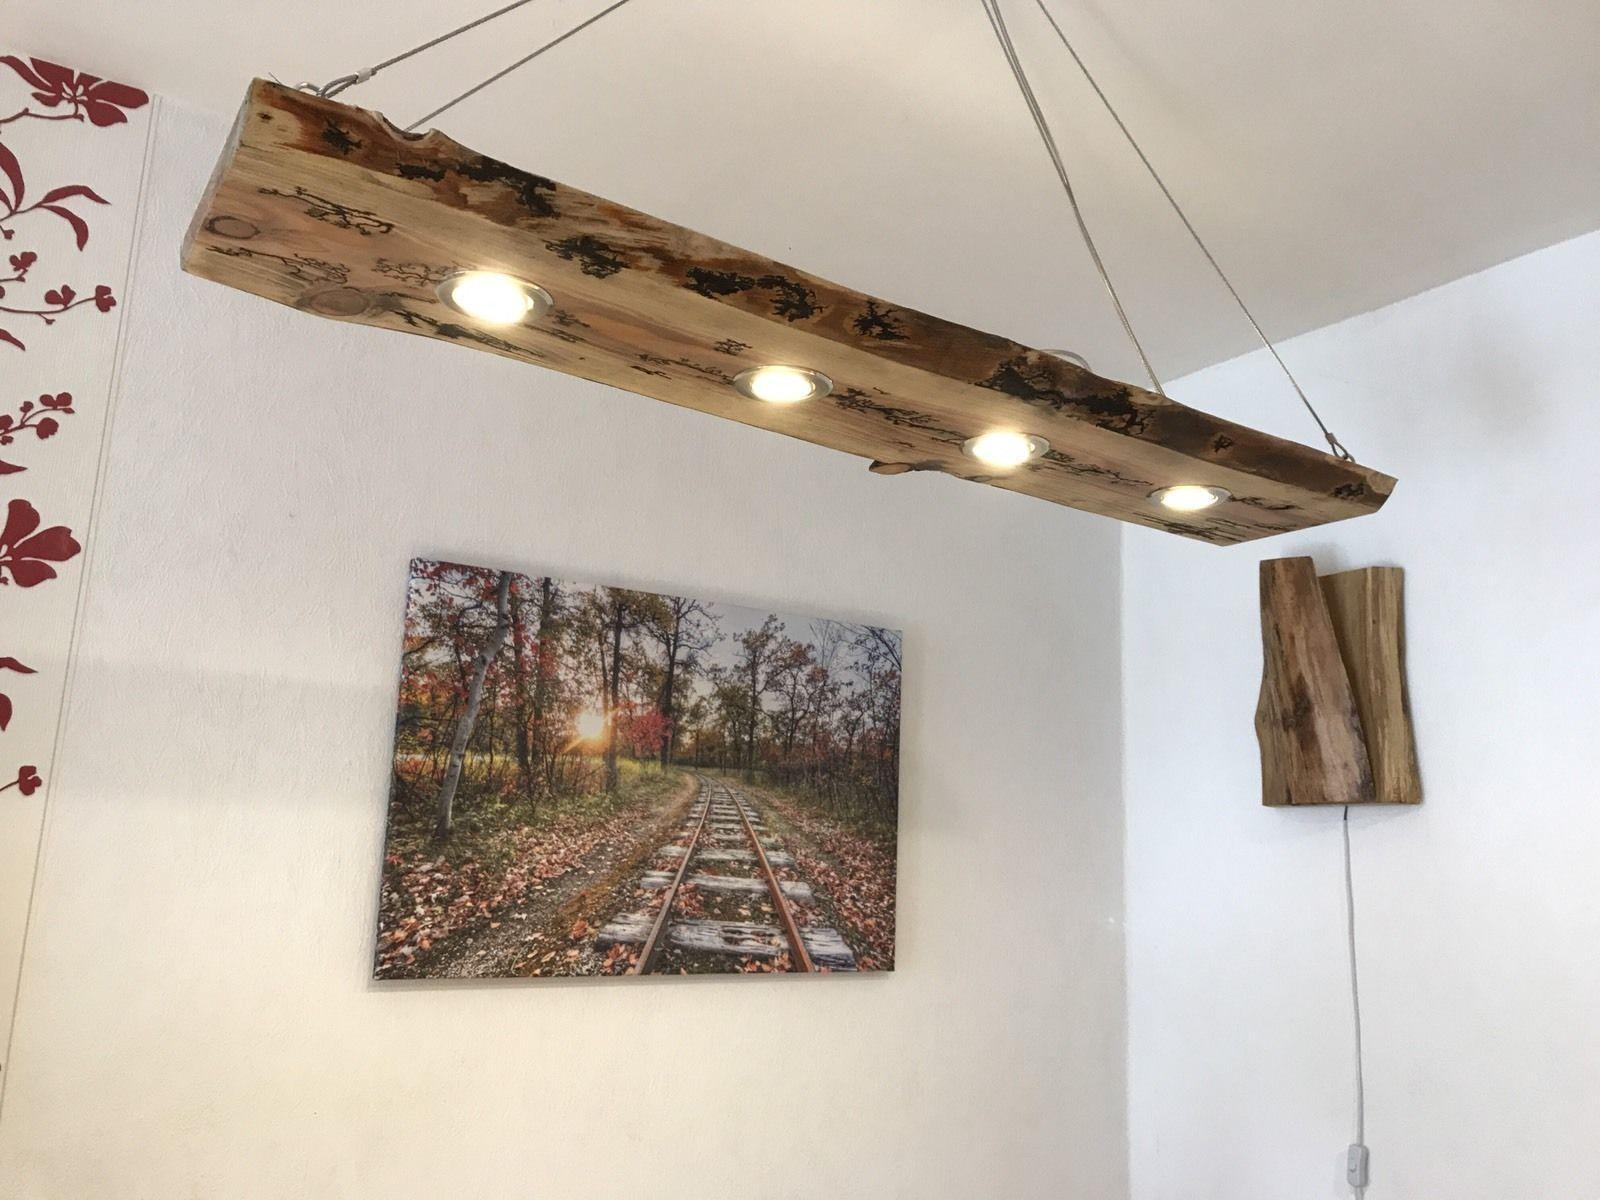 Led Decken Holz Lampe Rustikal 120cm 4x 7w Massivholz Lichtenberg Design Mobel Wohnen Beleuchtung Deckenlampe Lampe Kronleuchter Gunstig Rustikale Lampen